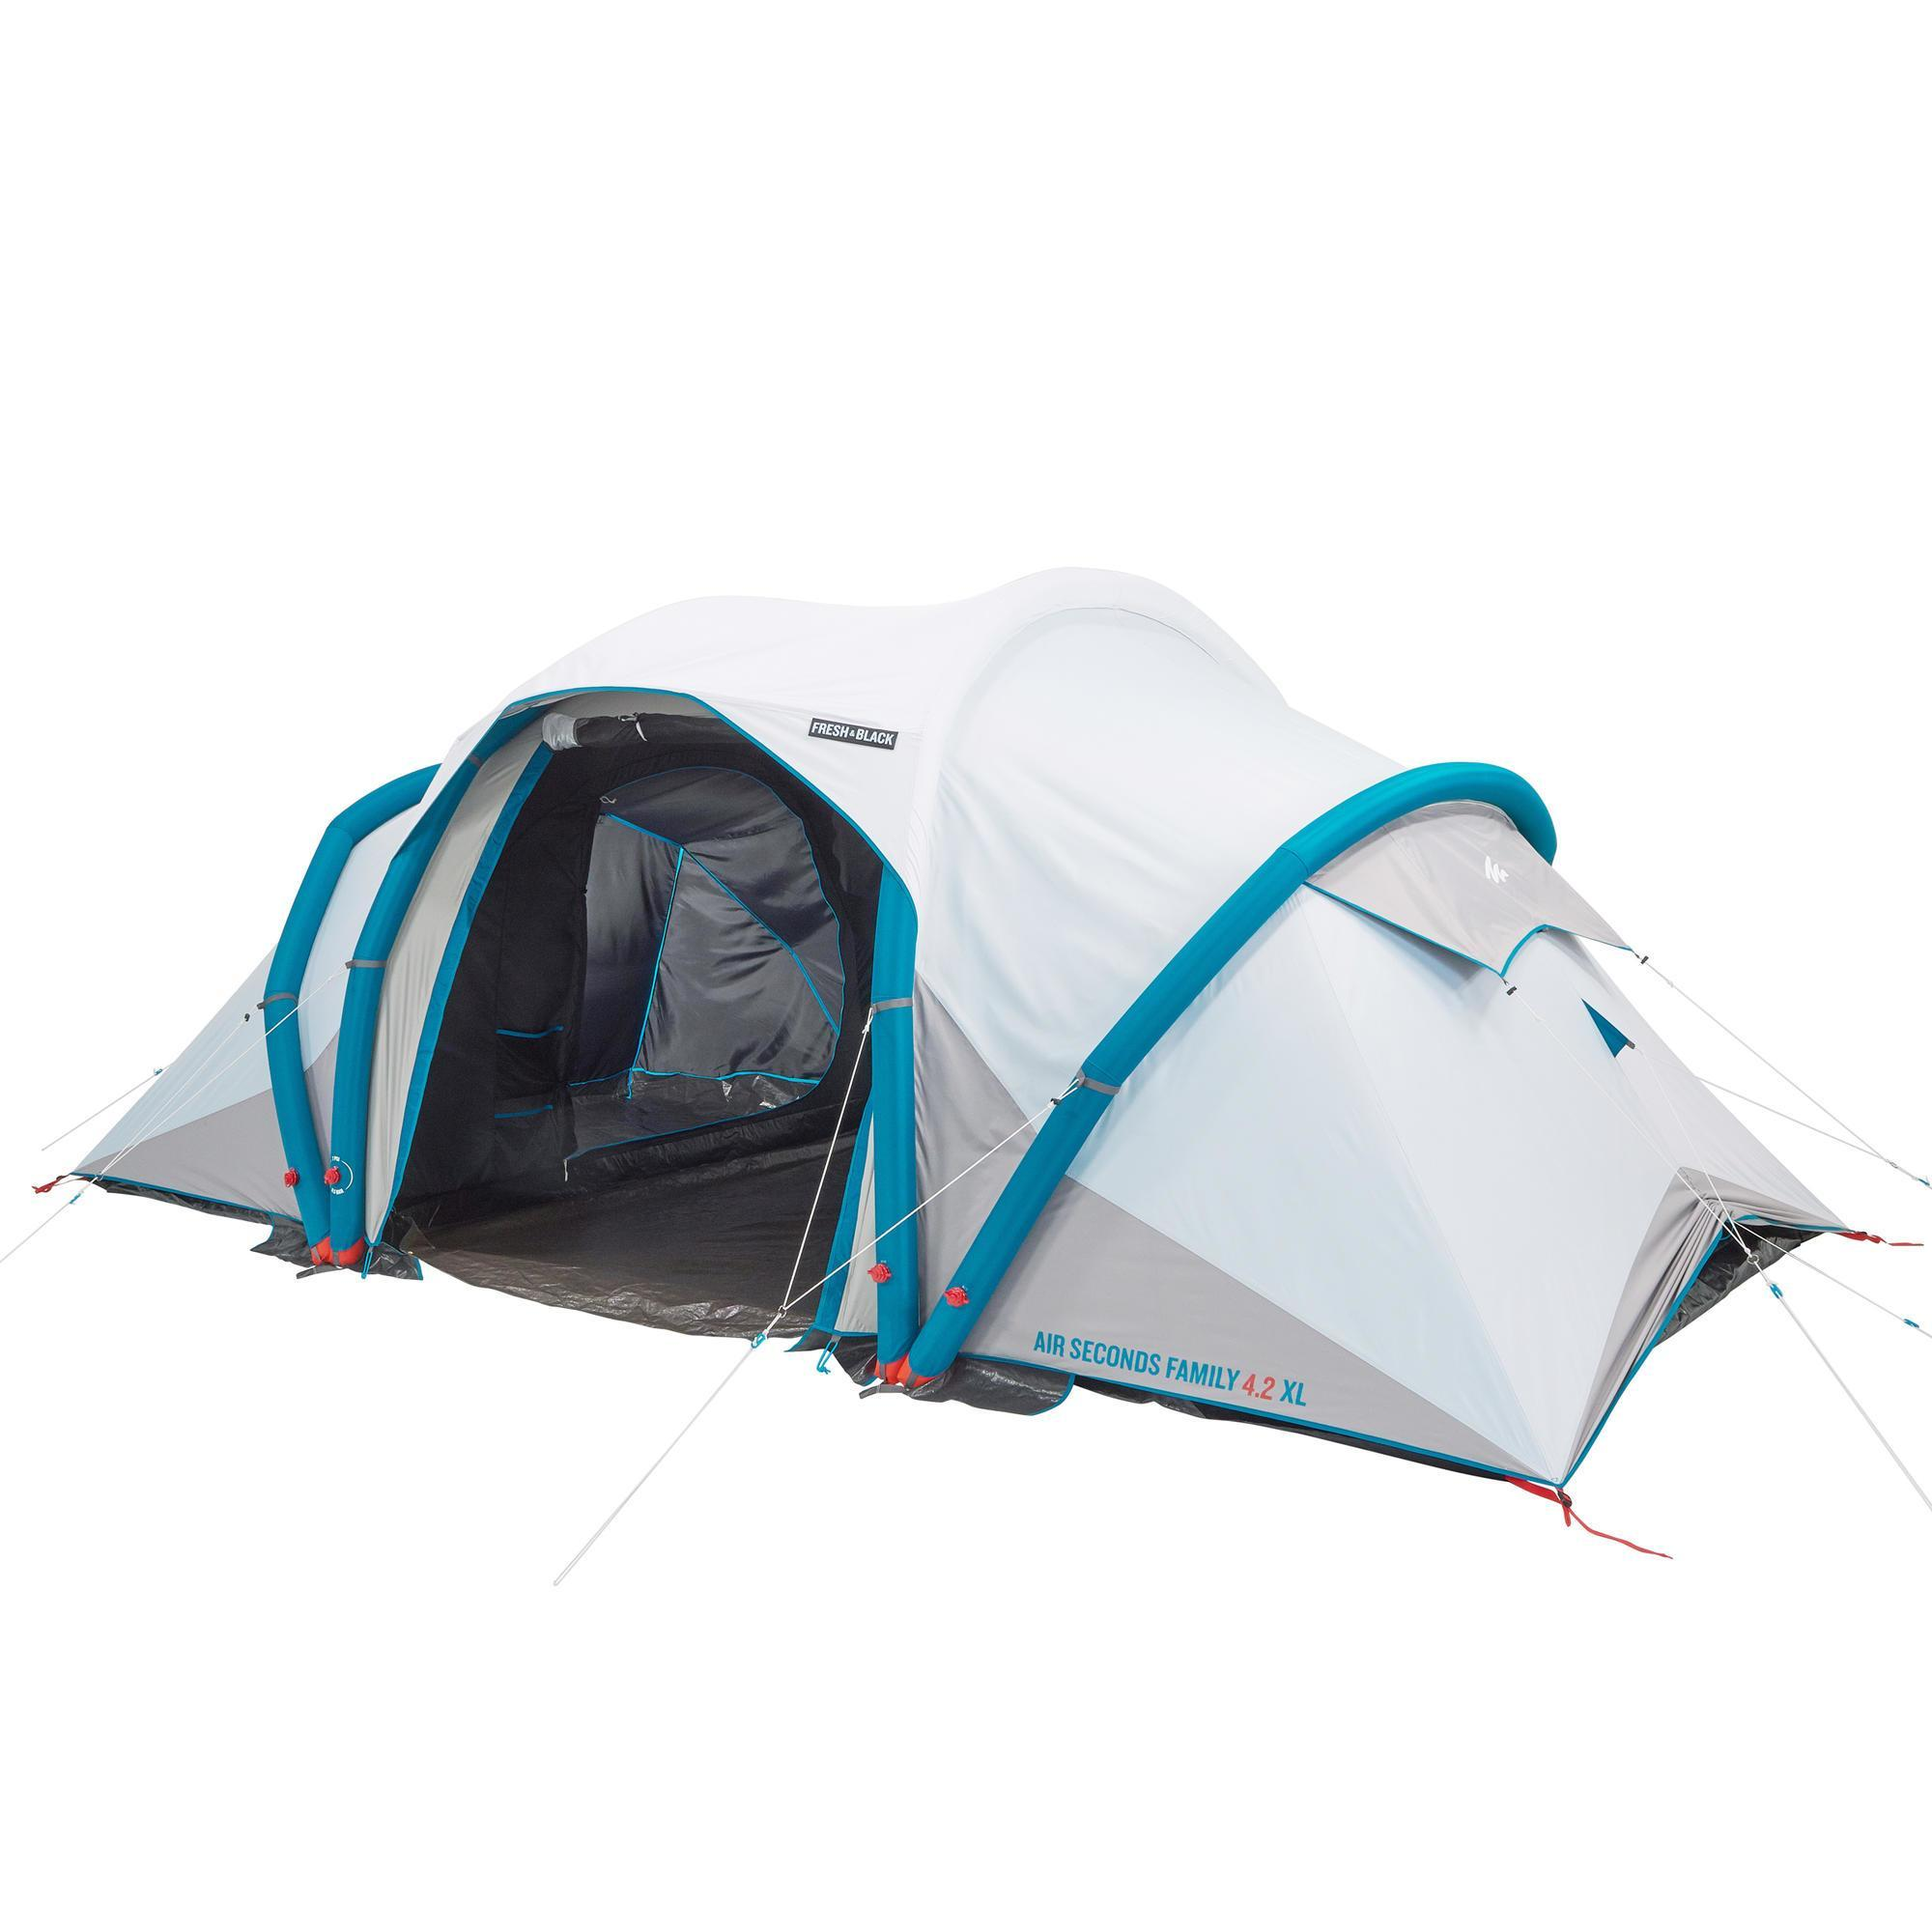 tente de camping familiale air seconds family 4 2 xl f b i. Black Bedroom Furniture Sets. Home Design Ideas